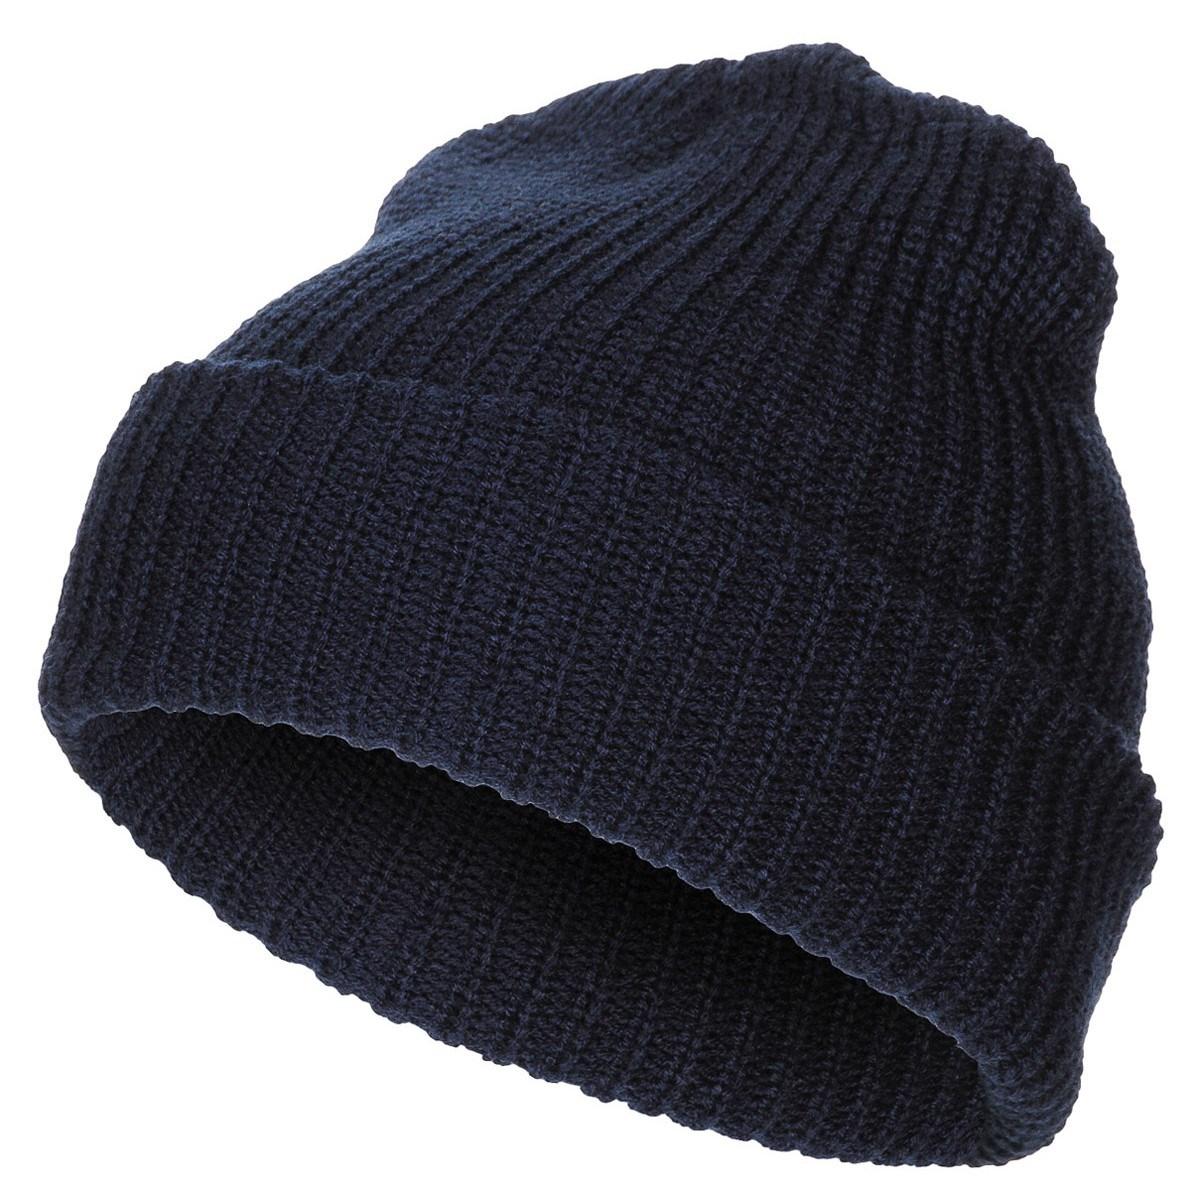 Čepice pletená Acryl MODRÁ